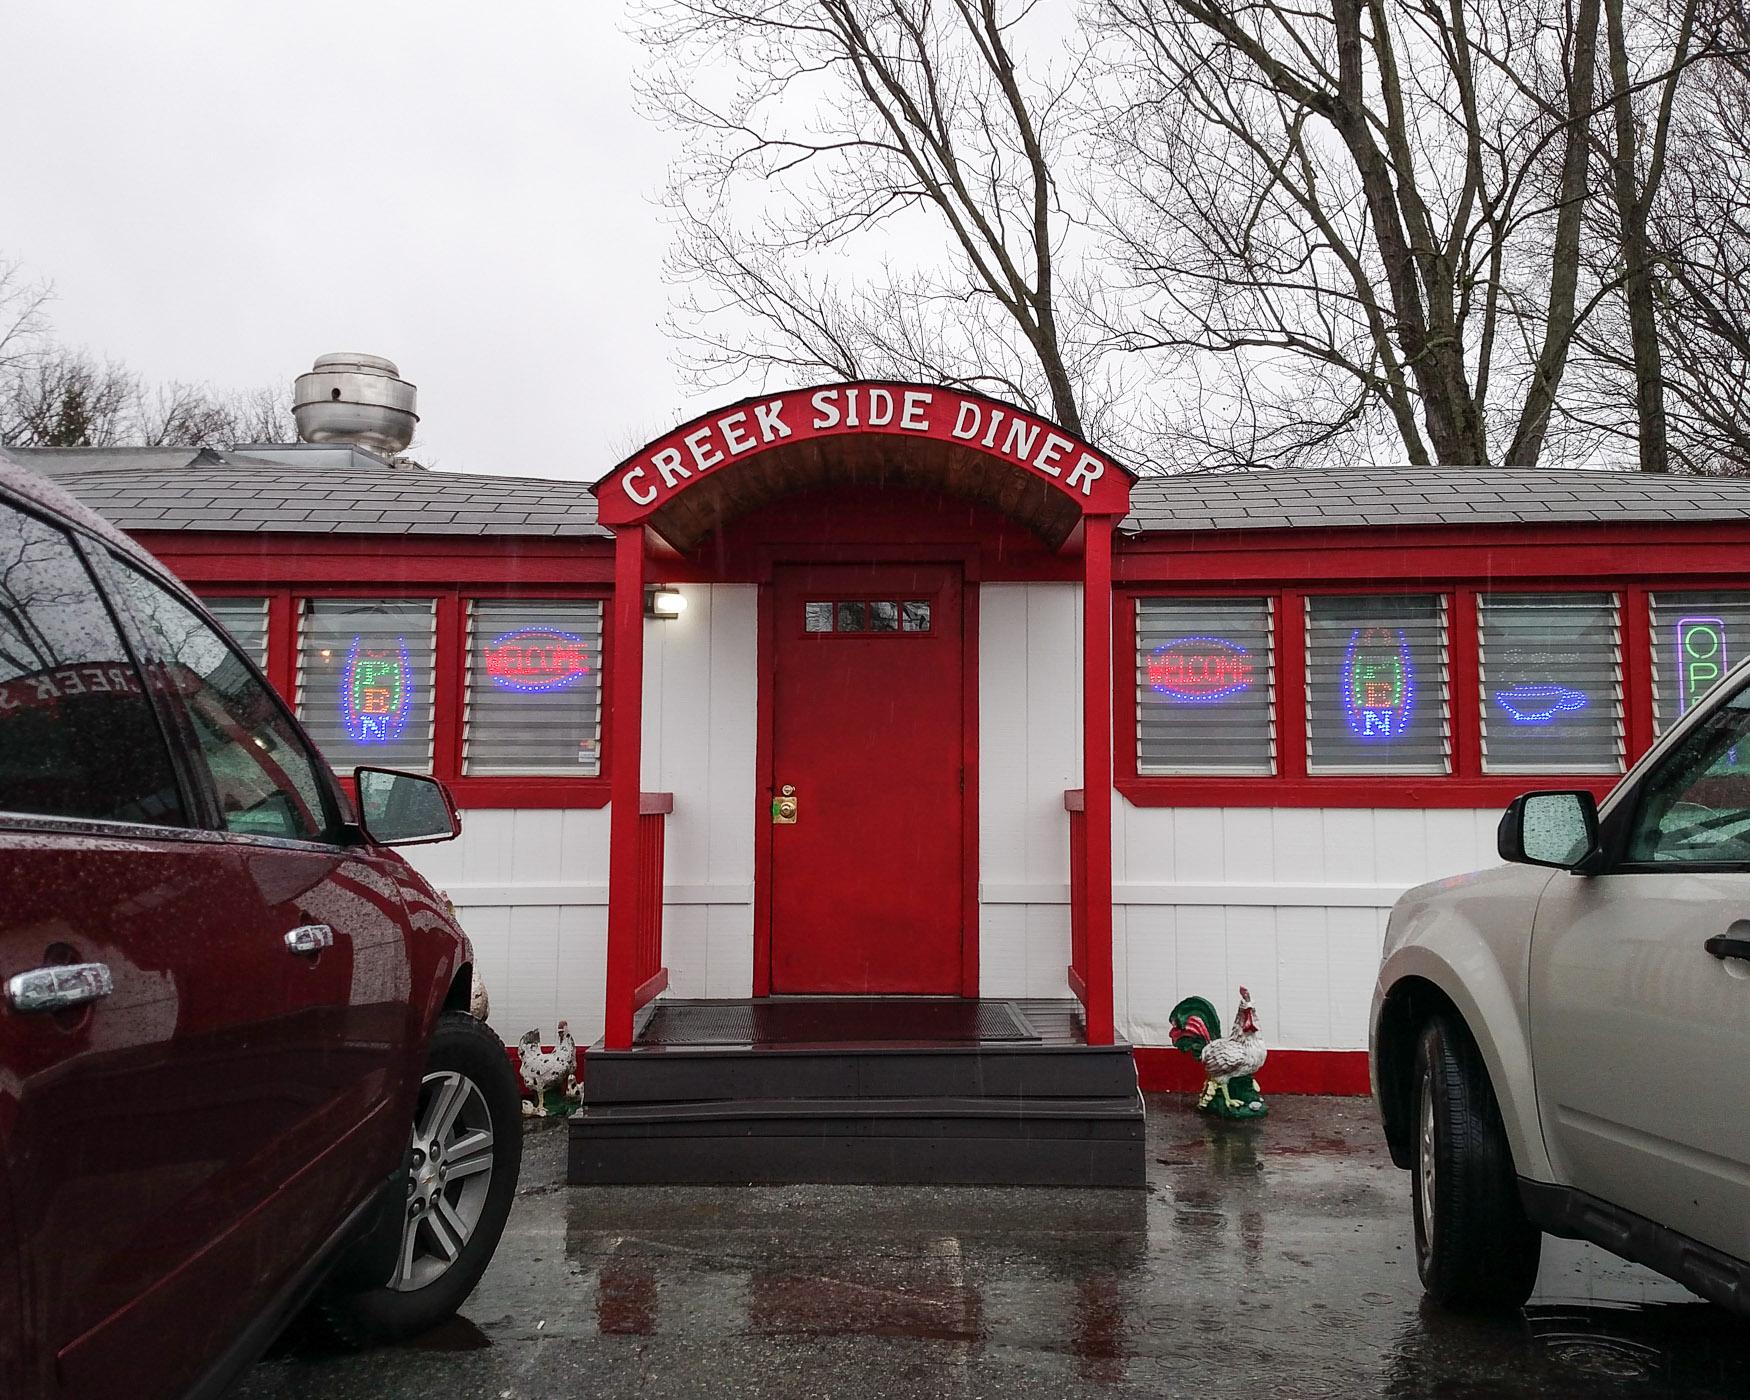 Creek Side Diner \ \ Kennett Square \ \ 4/6/17